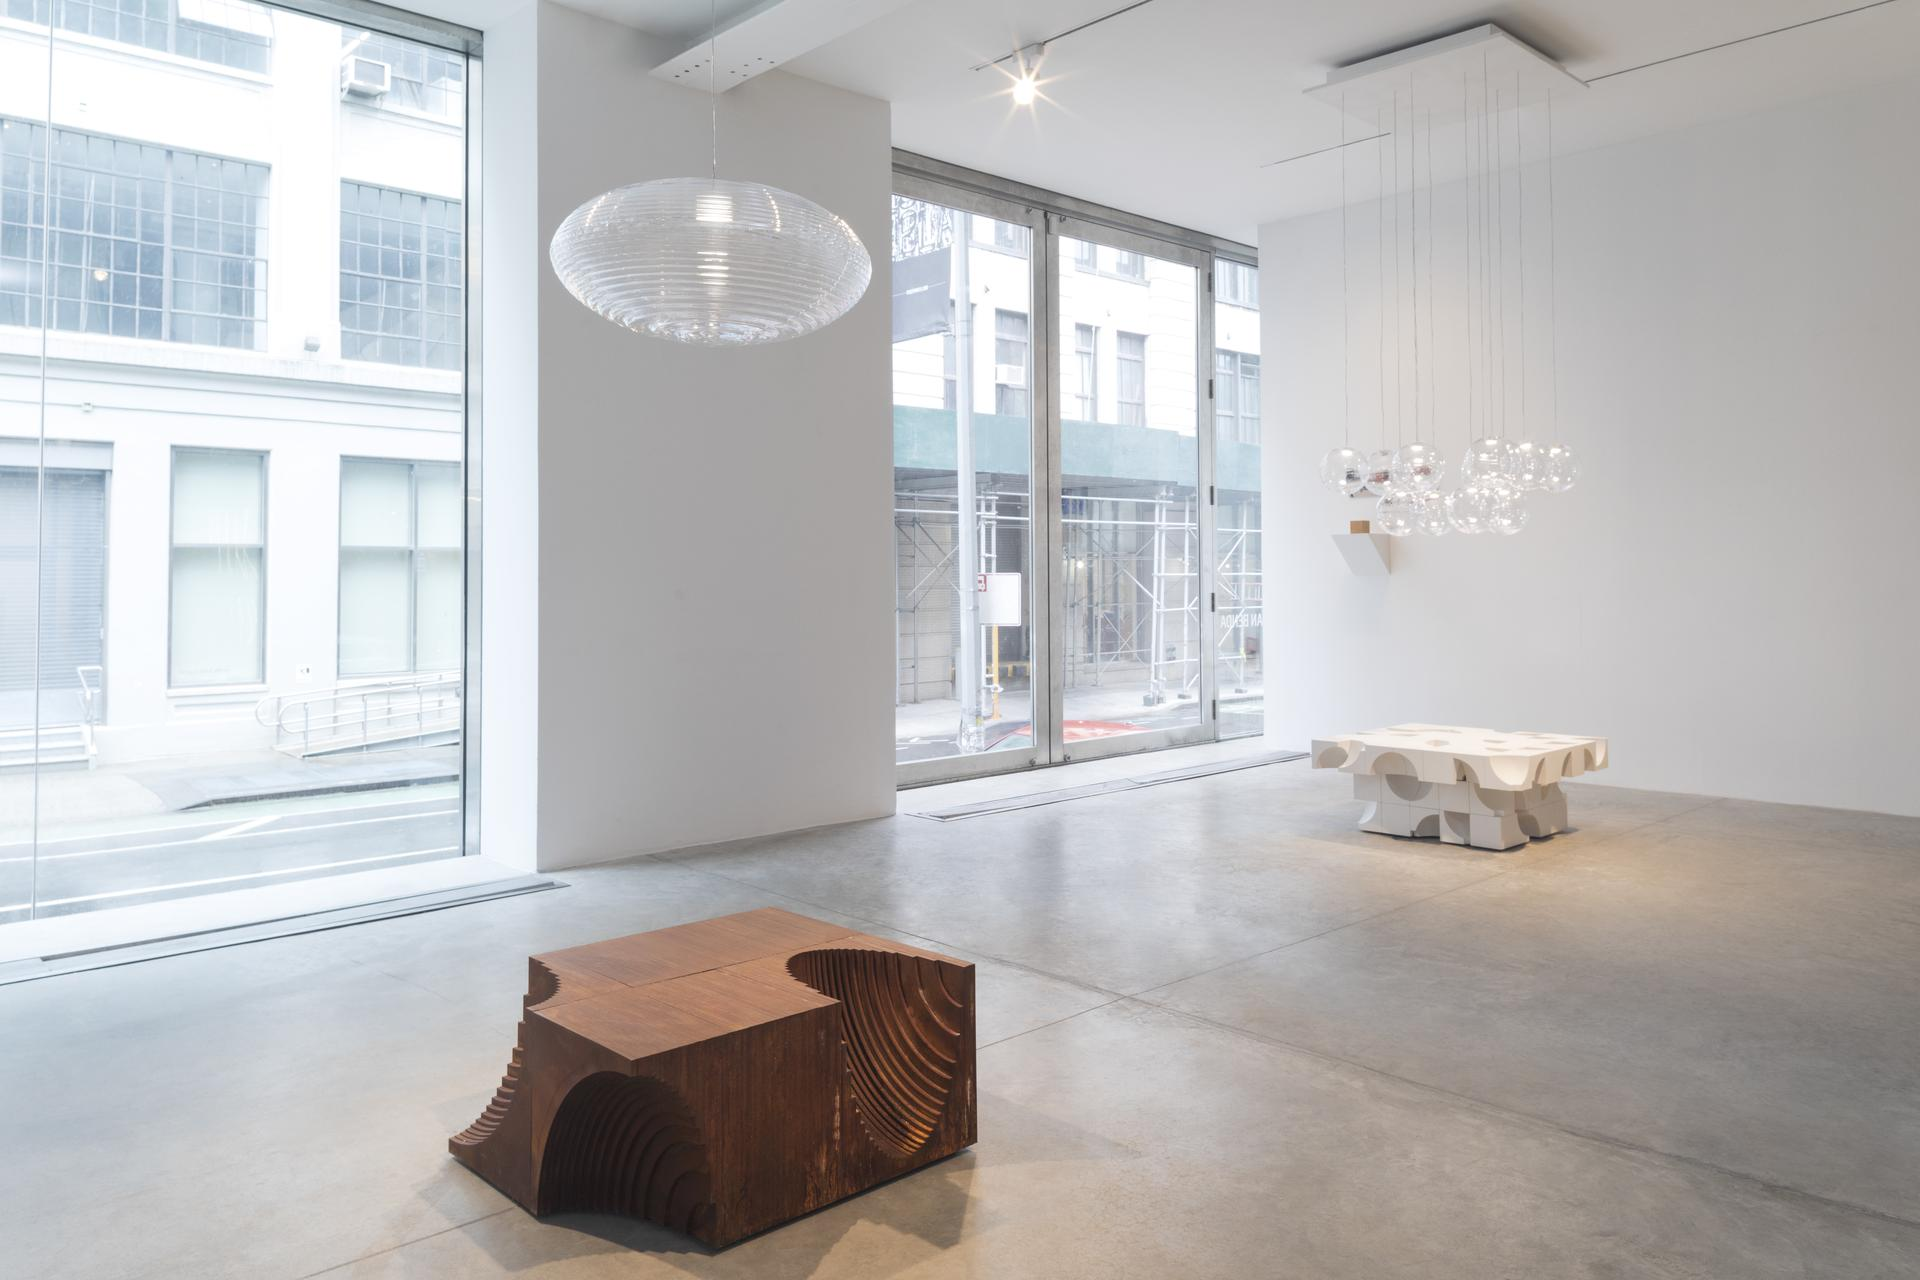 Paul Cocksedge: Performance - Exhibitions